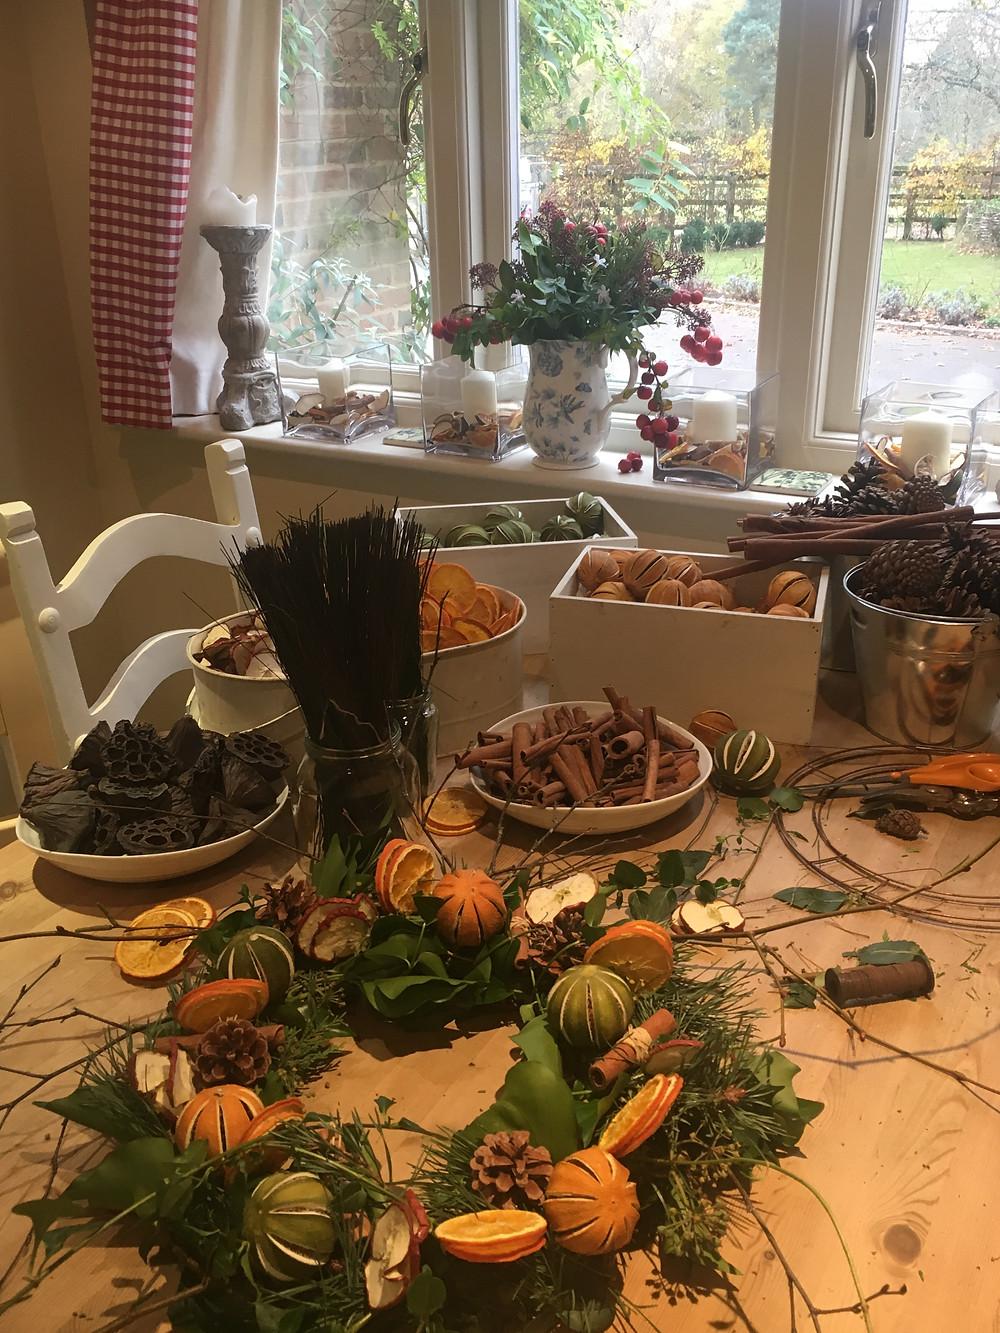 Christmas wreath making workshops in Churt, Farnham